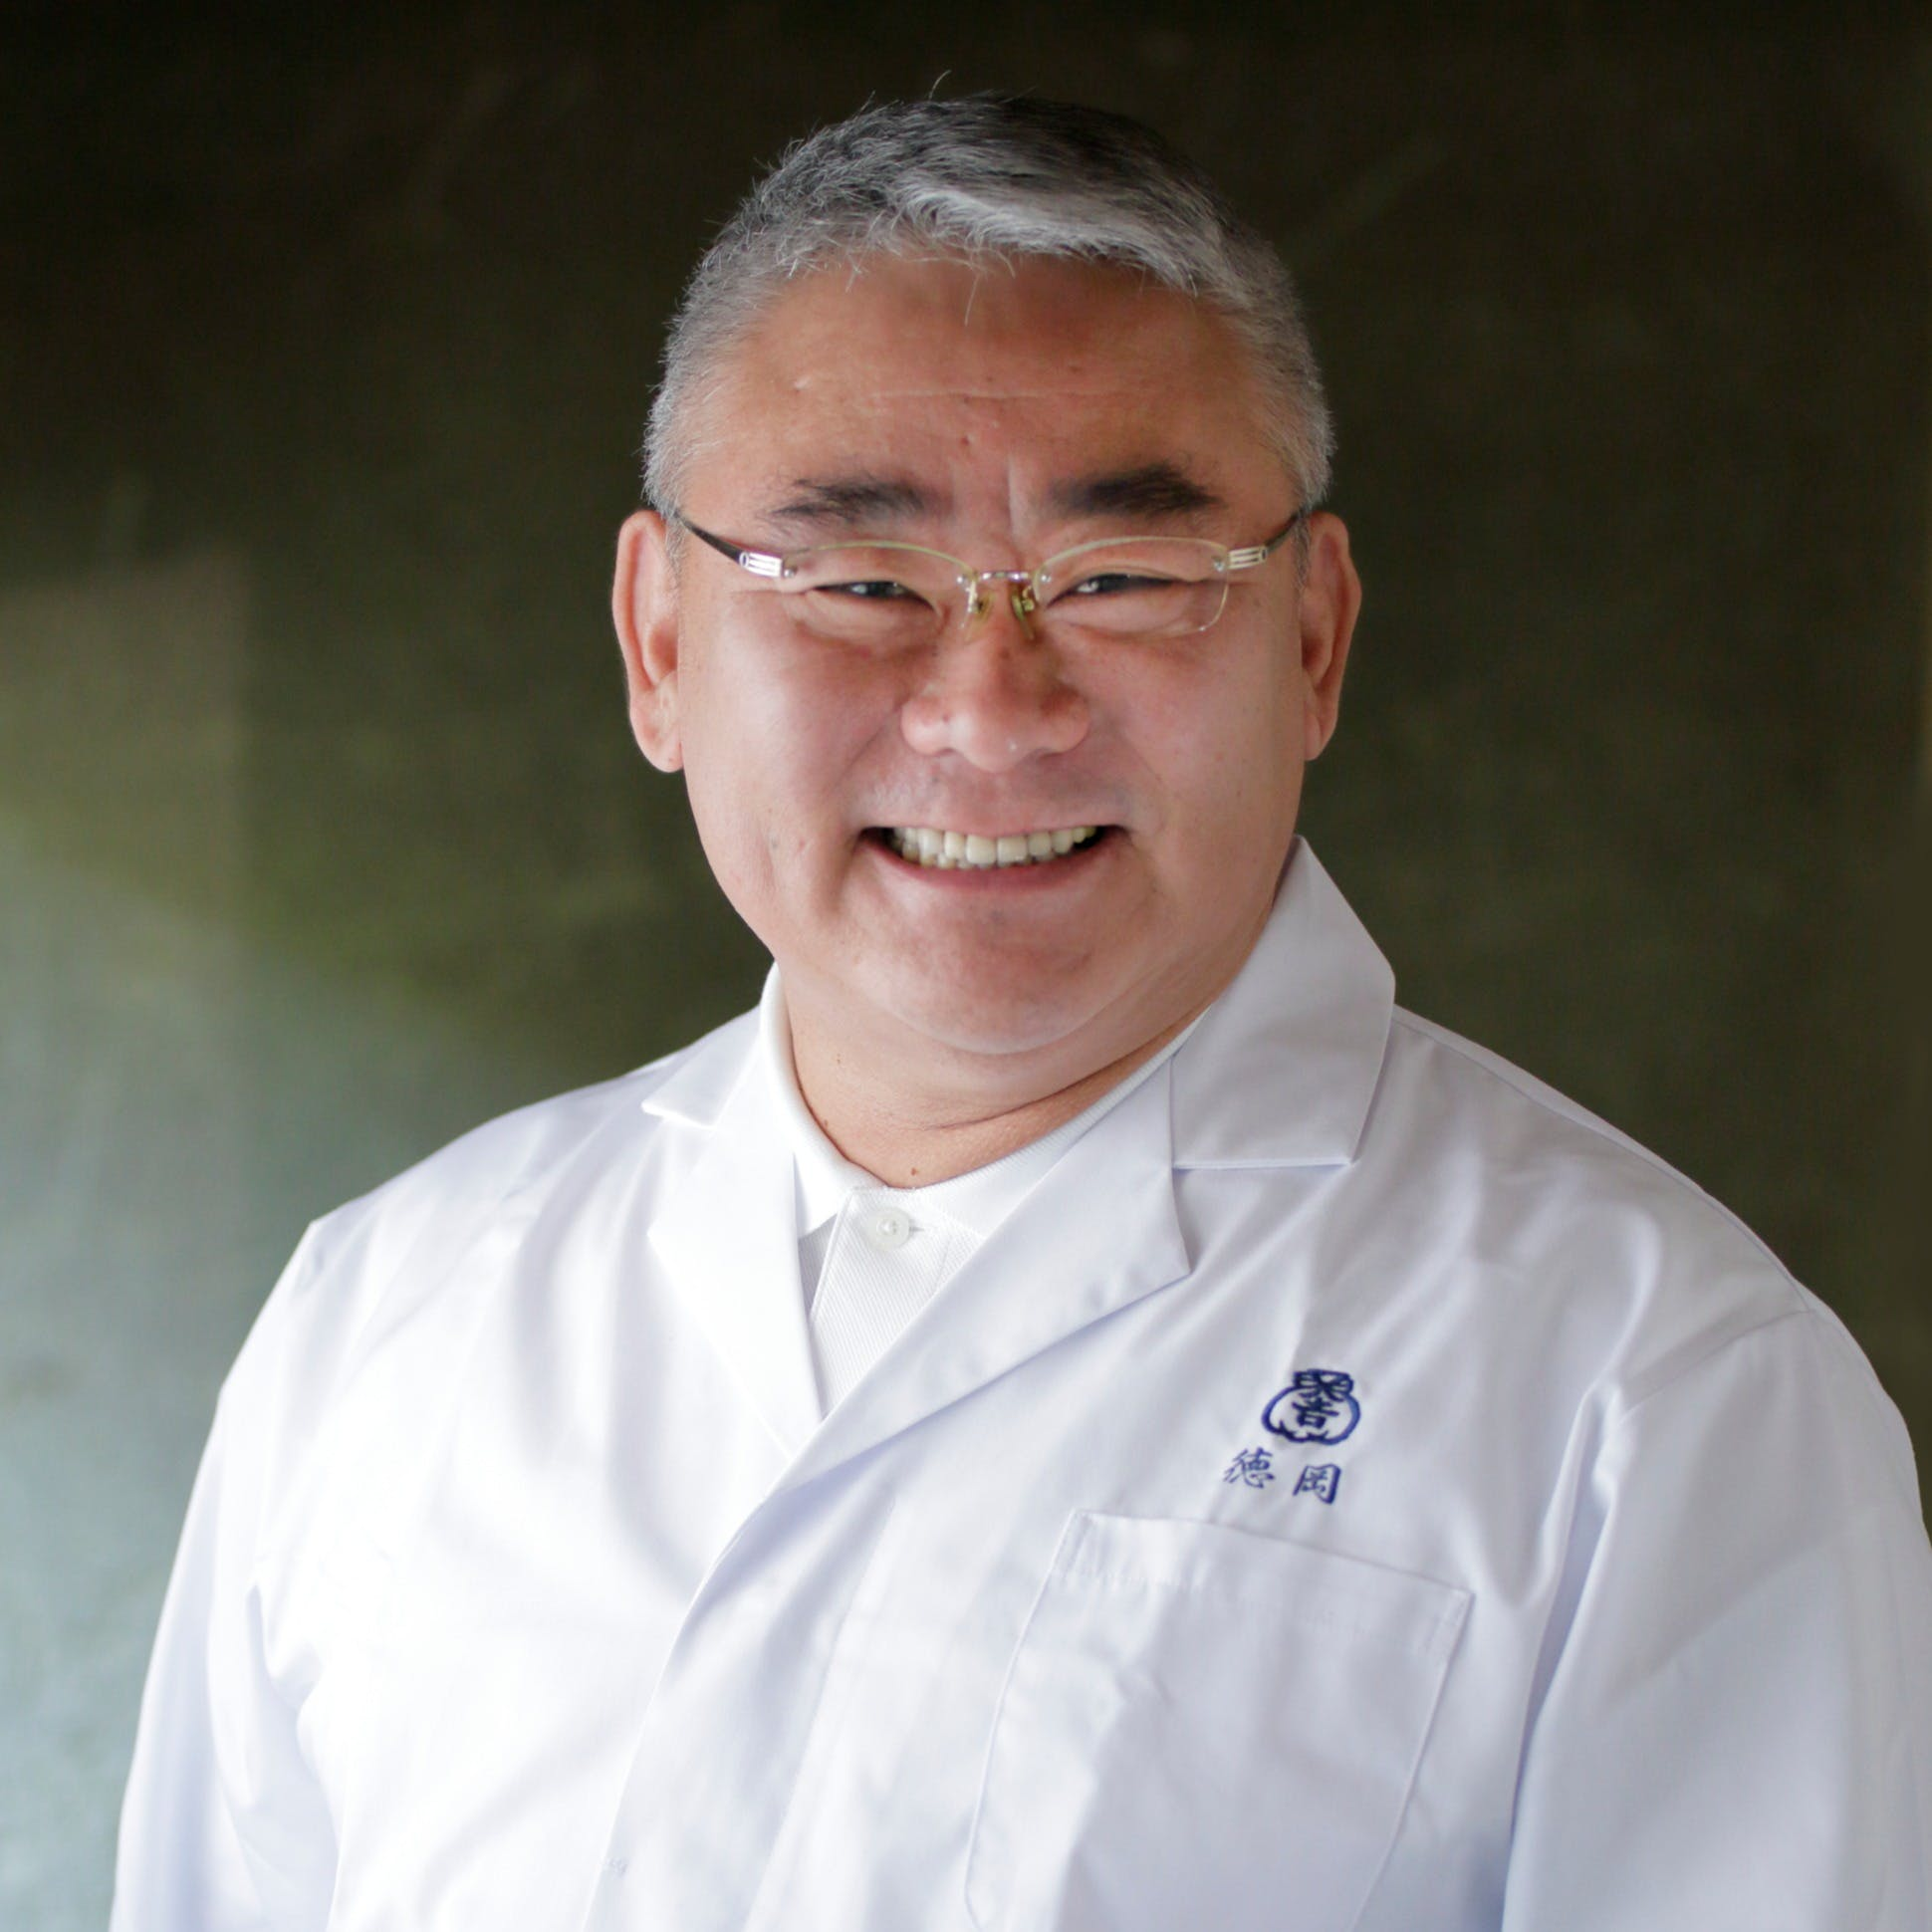 「総料理長 徳岡邦夫(Kunio Tokuoka)」